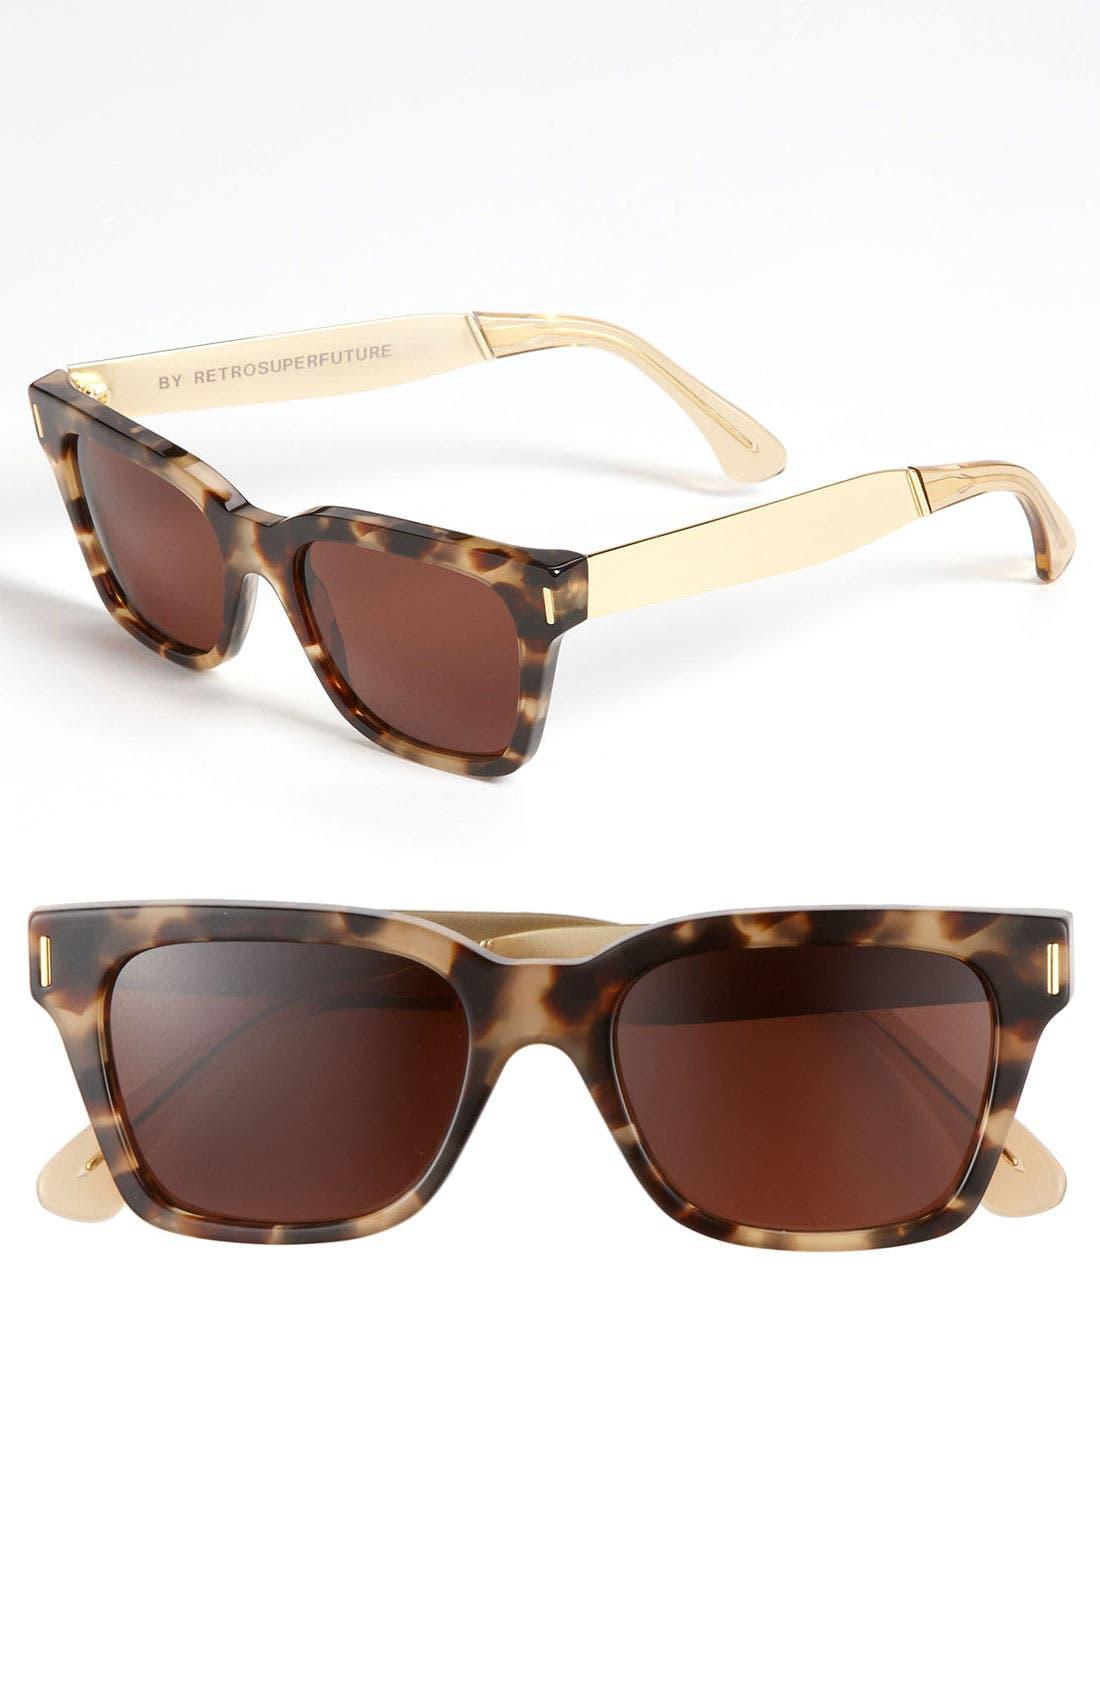 Alternate Image 1 Selected - SUPER by RETROSUPERFUTURE® 'America' 50mm Sunglasses